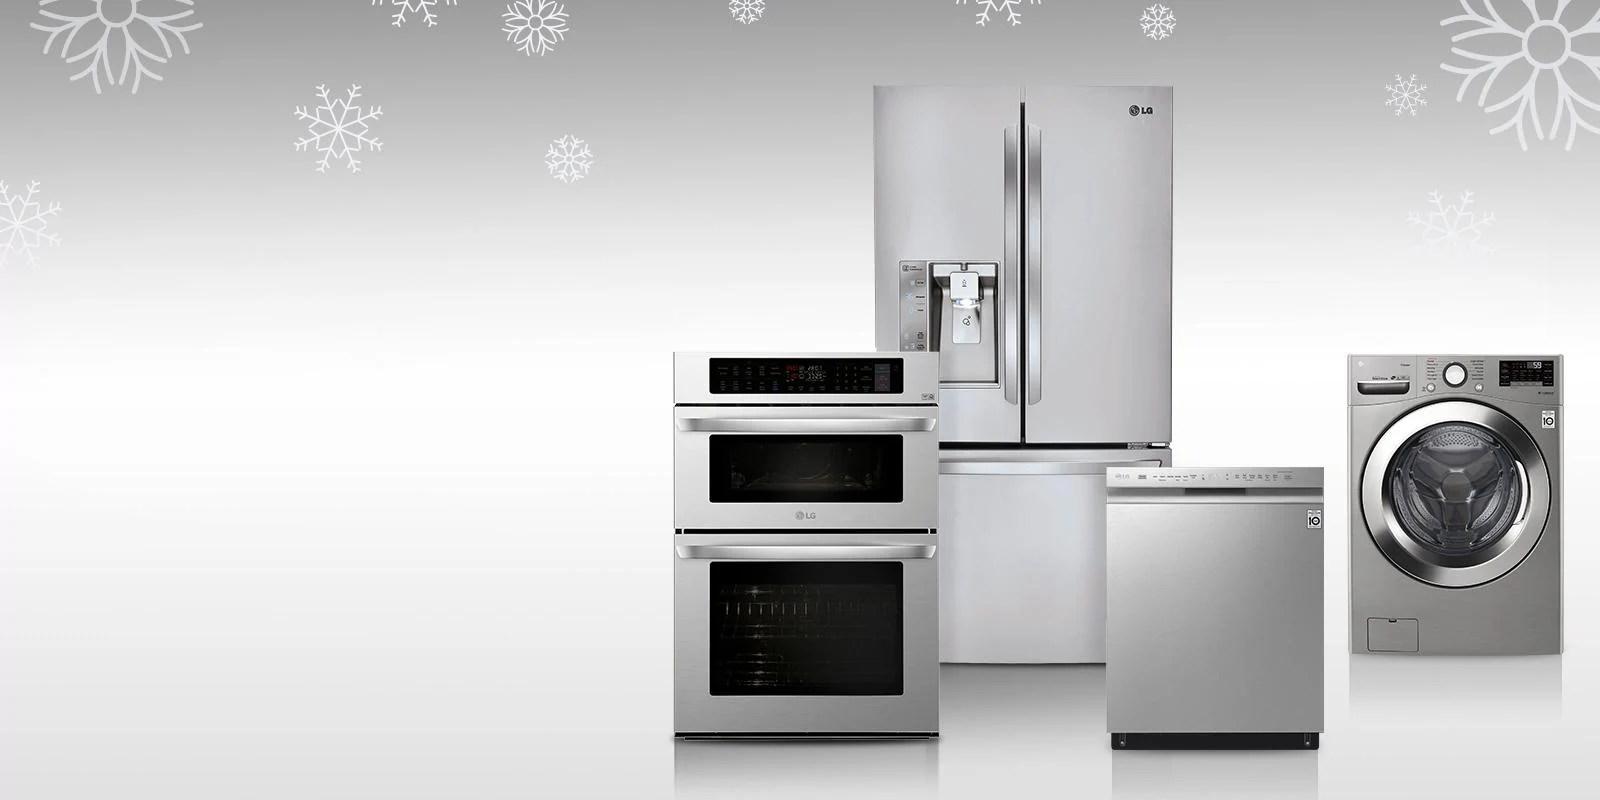 hight resolution of save 2 550 on a 4 piece kitchen bundle